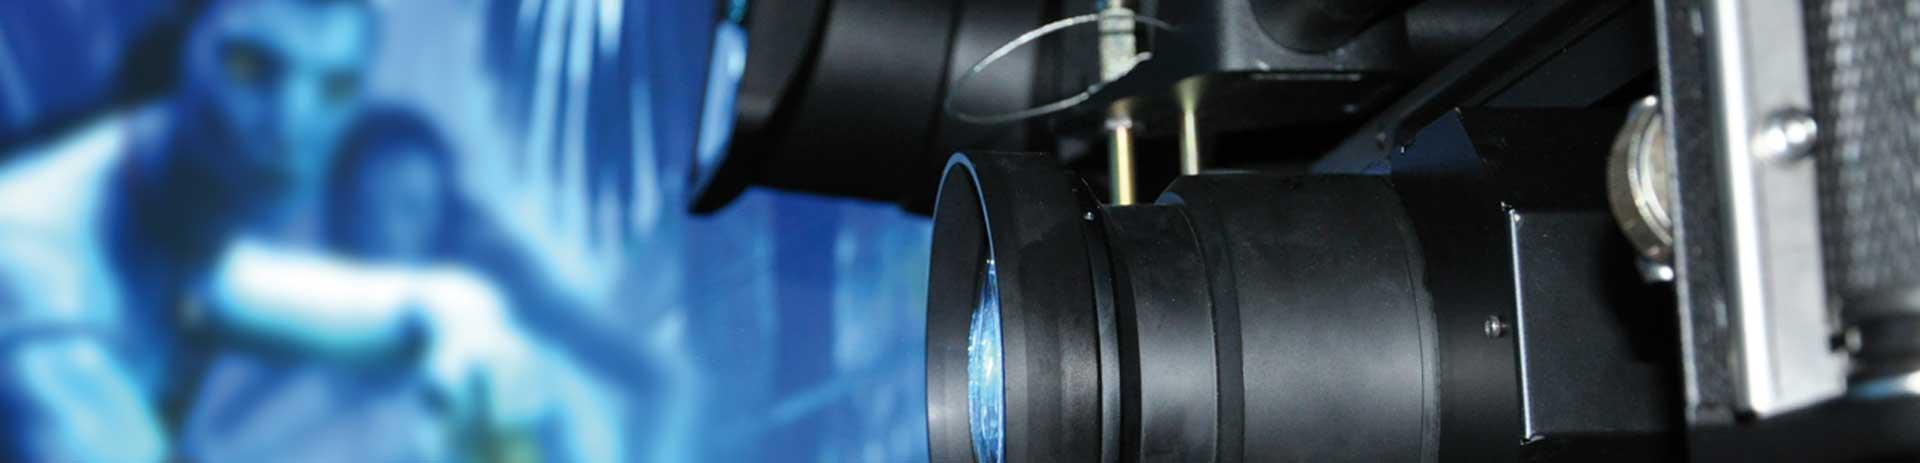 Hintergrundbild Projektoren Nahaufnahme